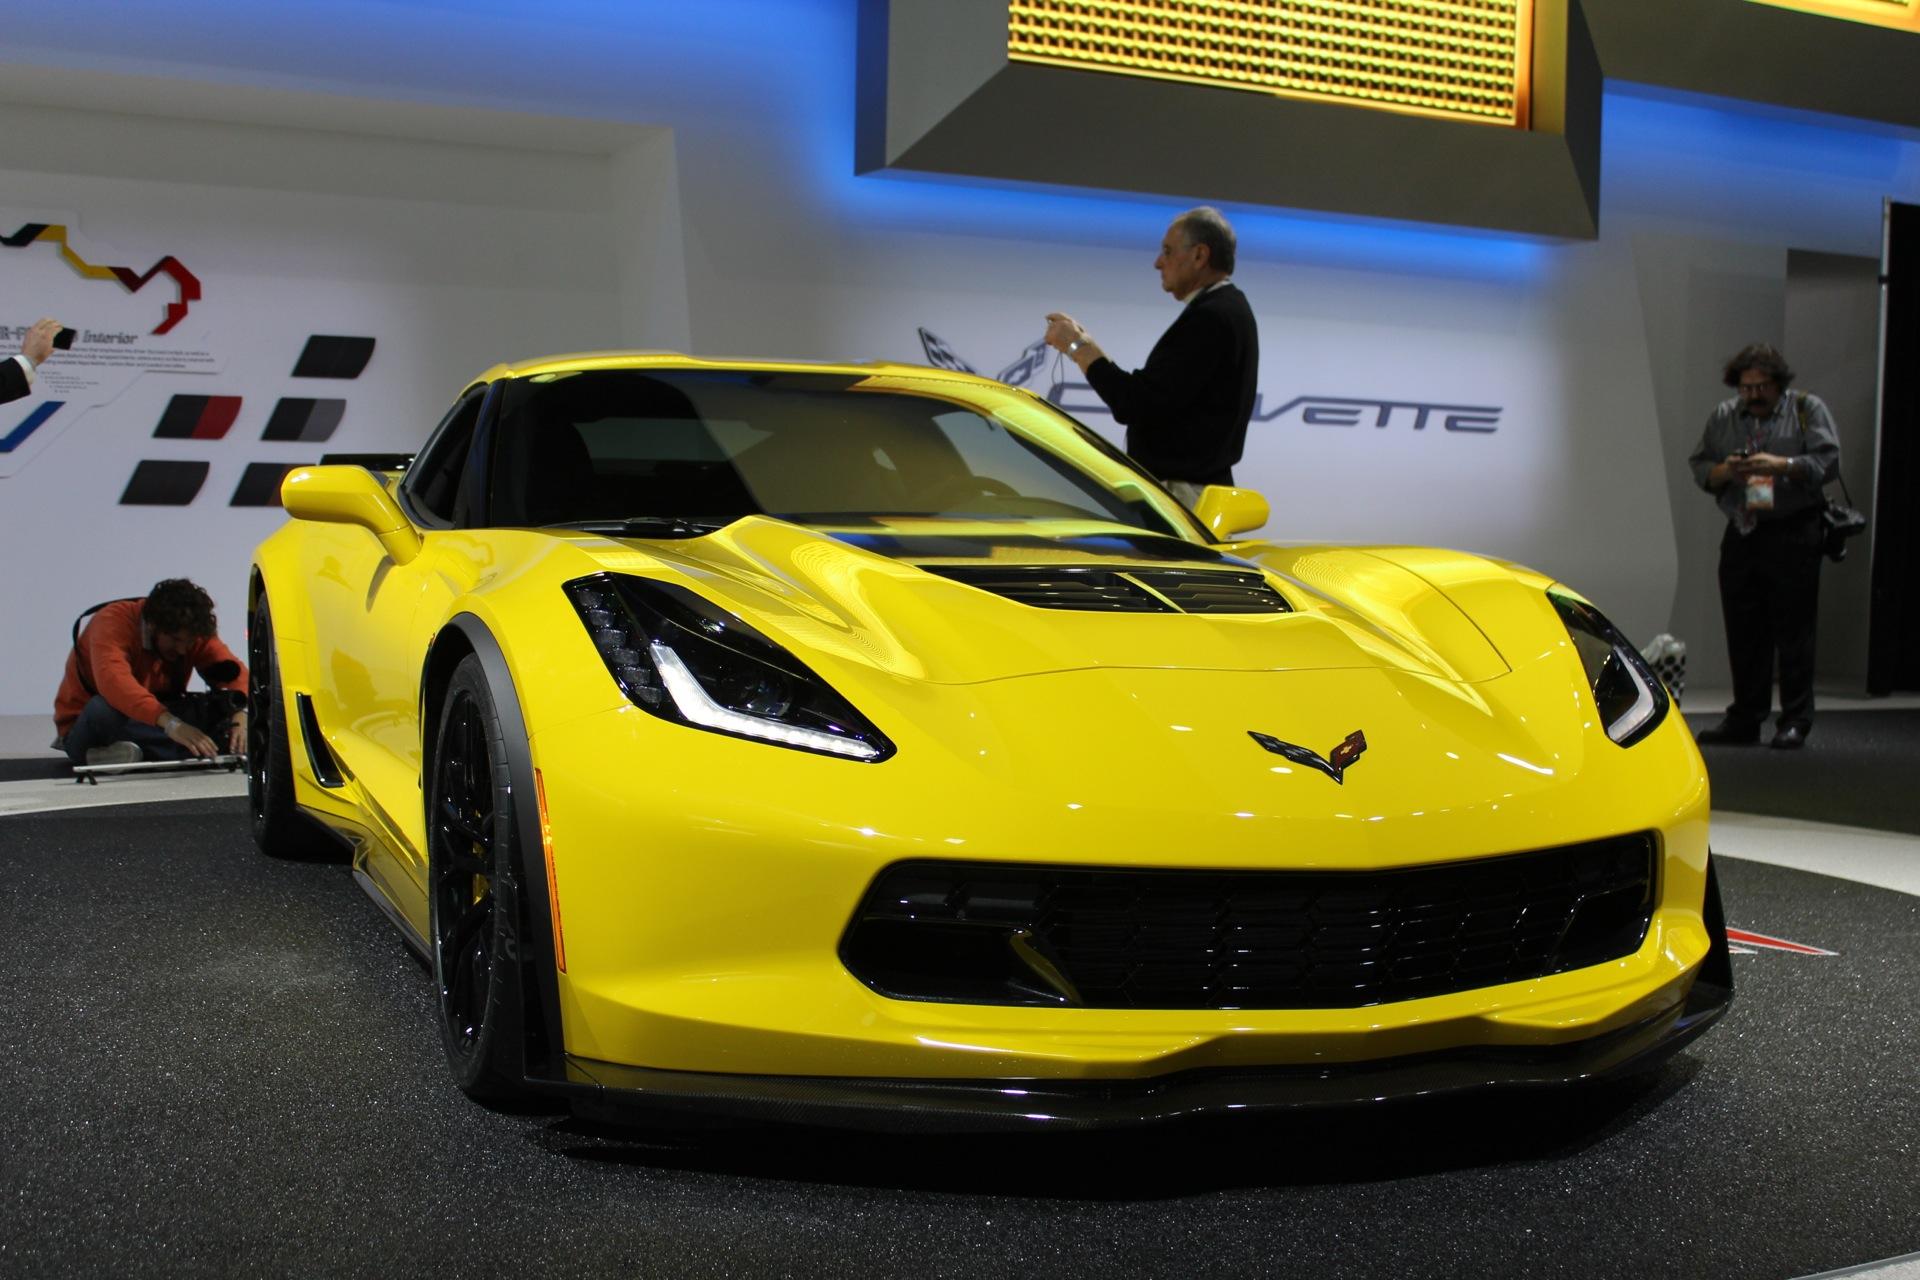 2015 Chevrolet Corvette Z06 Much Heavier Than Predecessor